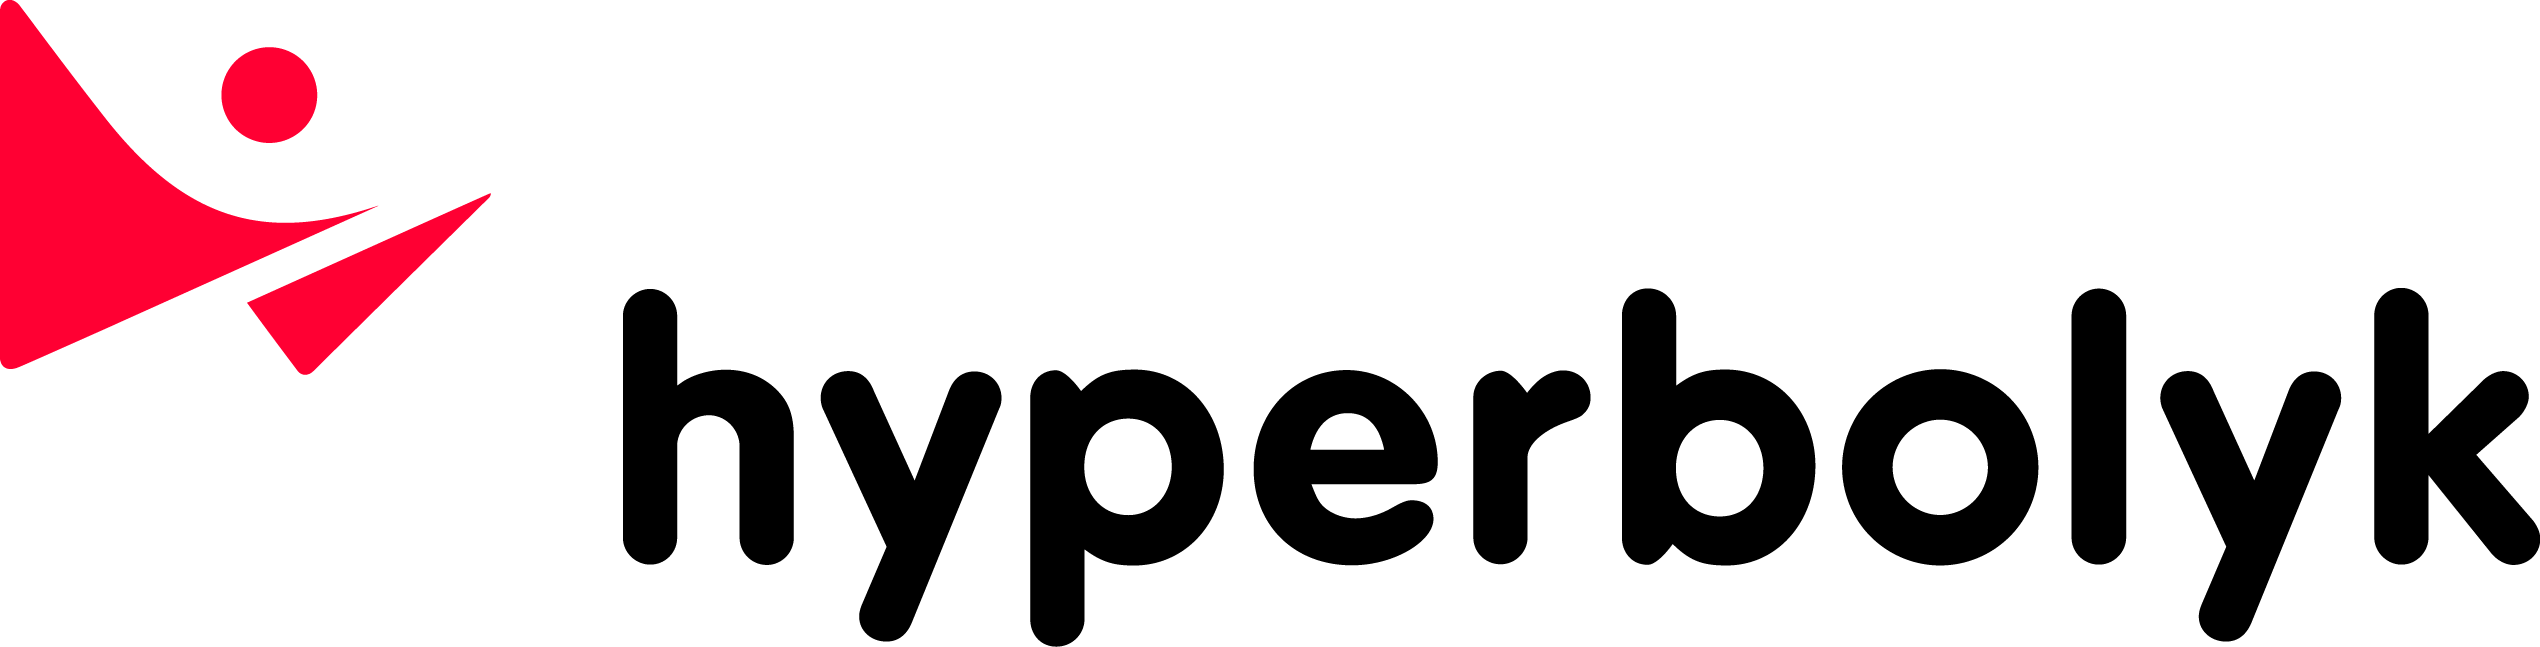 HYPERBOLYK_logo1.png